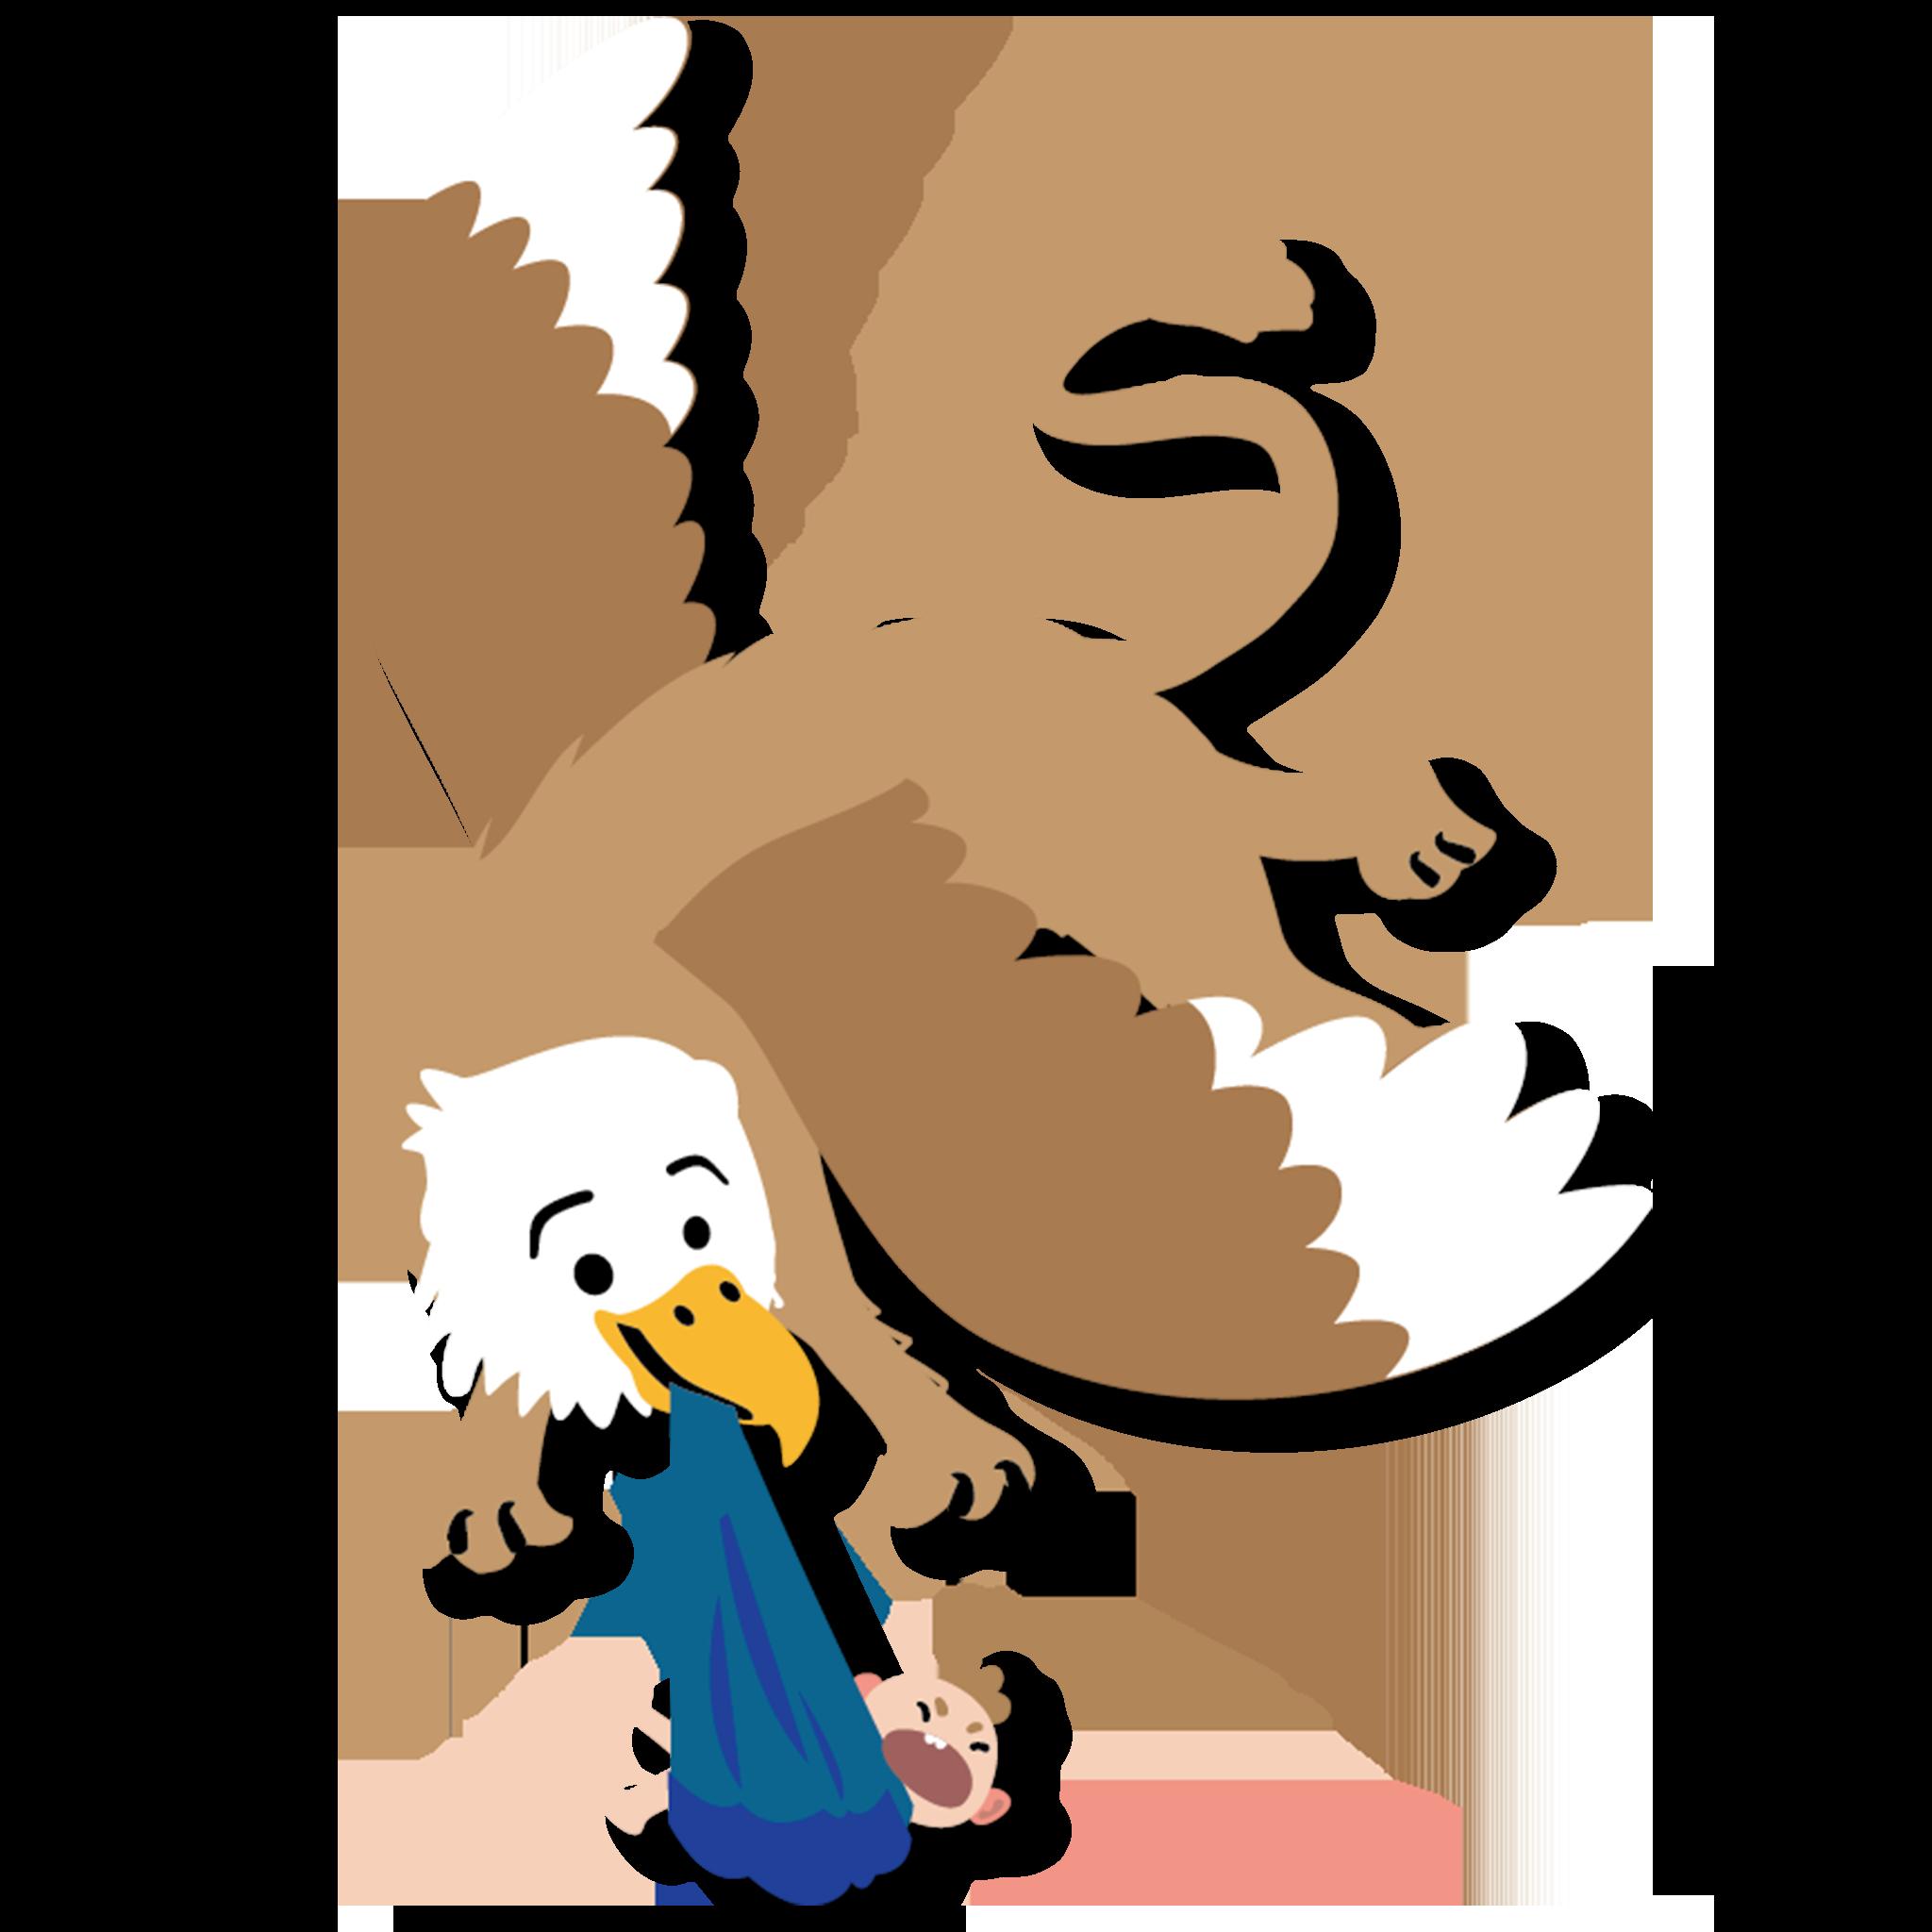 Griffon holding a baby like a stork